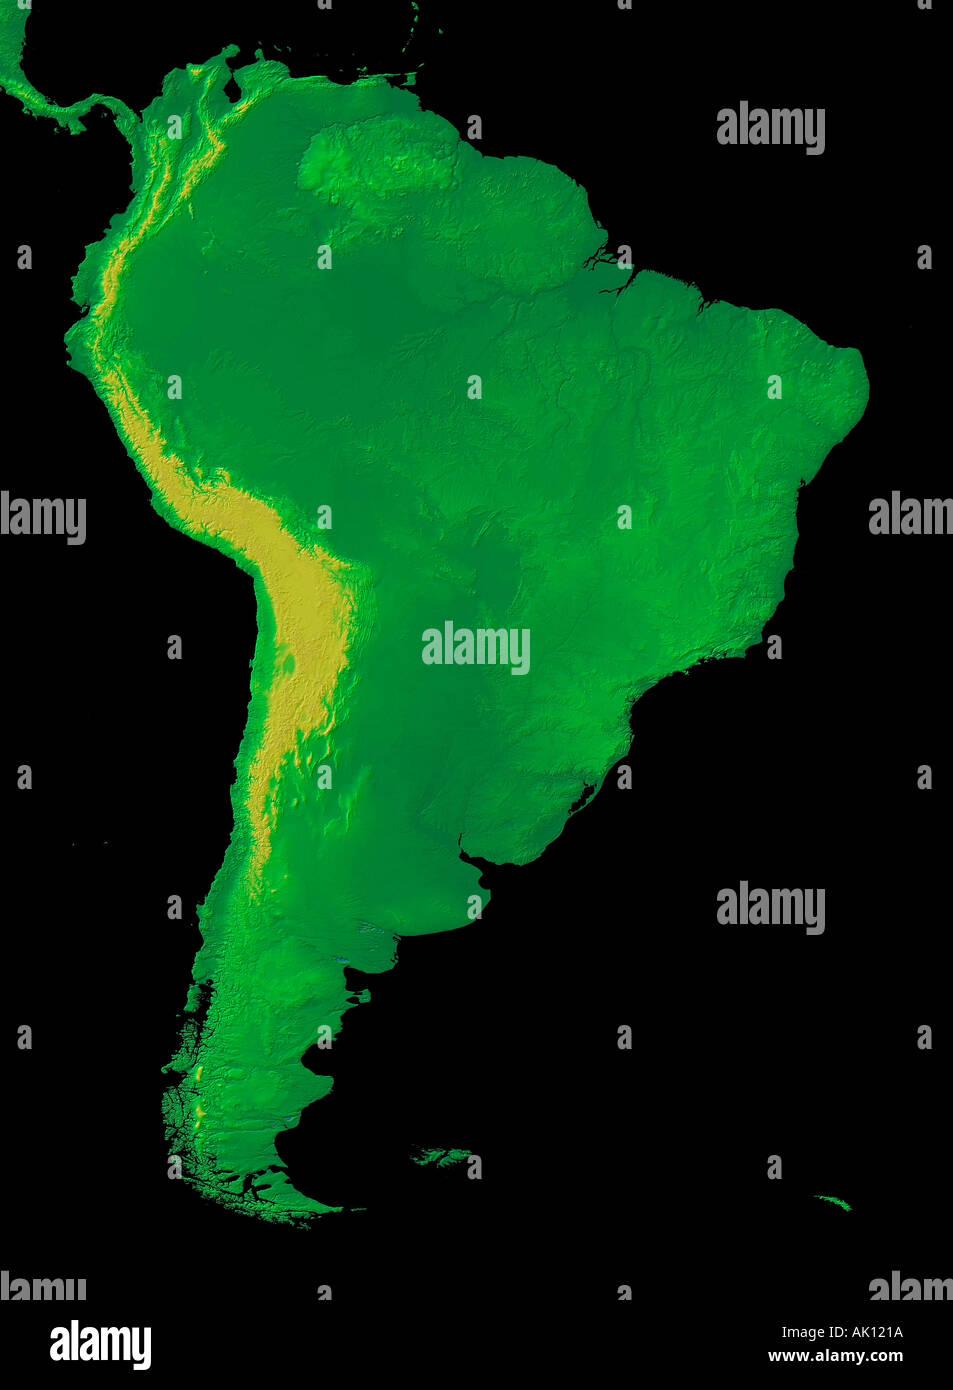 Digital Elevation Map Of South America Earth From Space Stock - Digital elevation map of the world